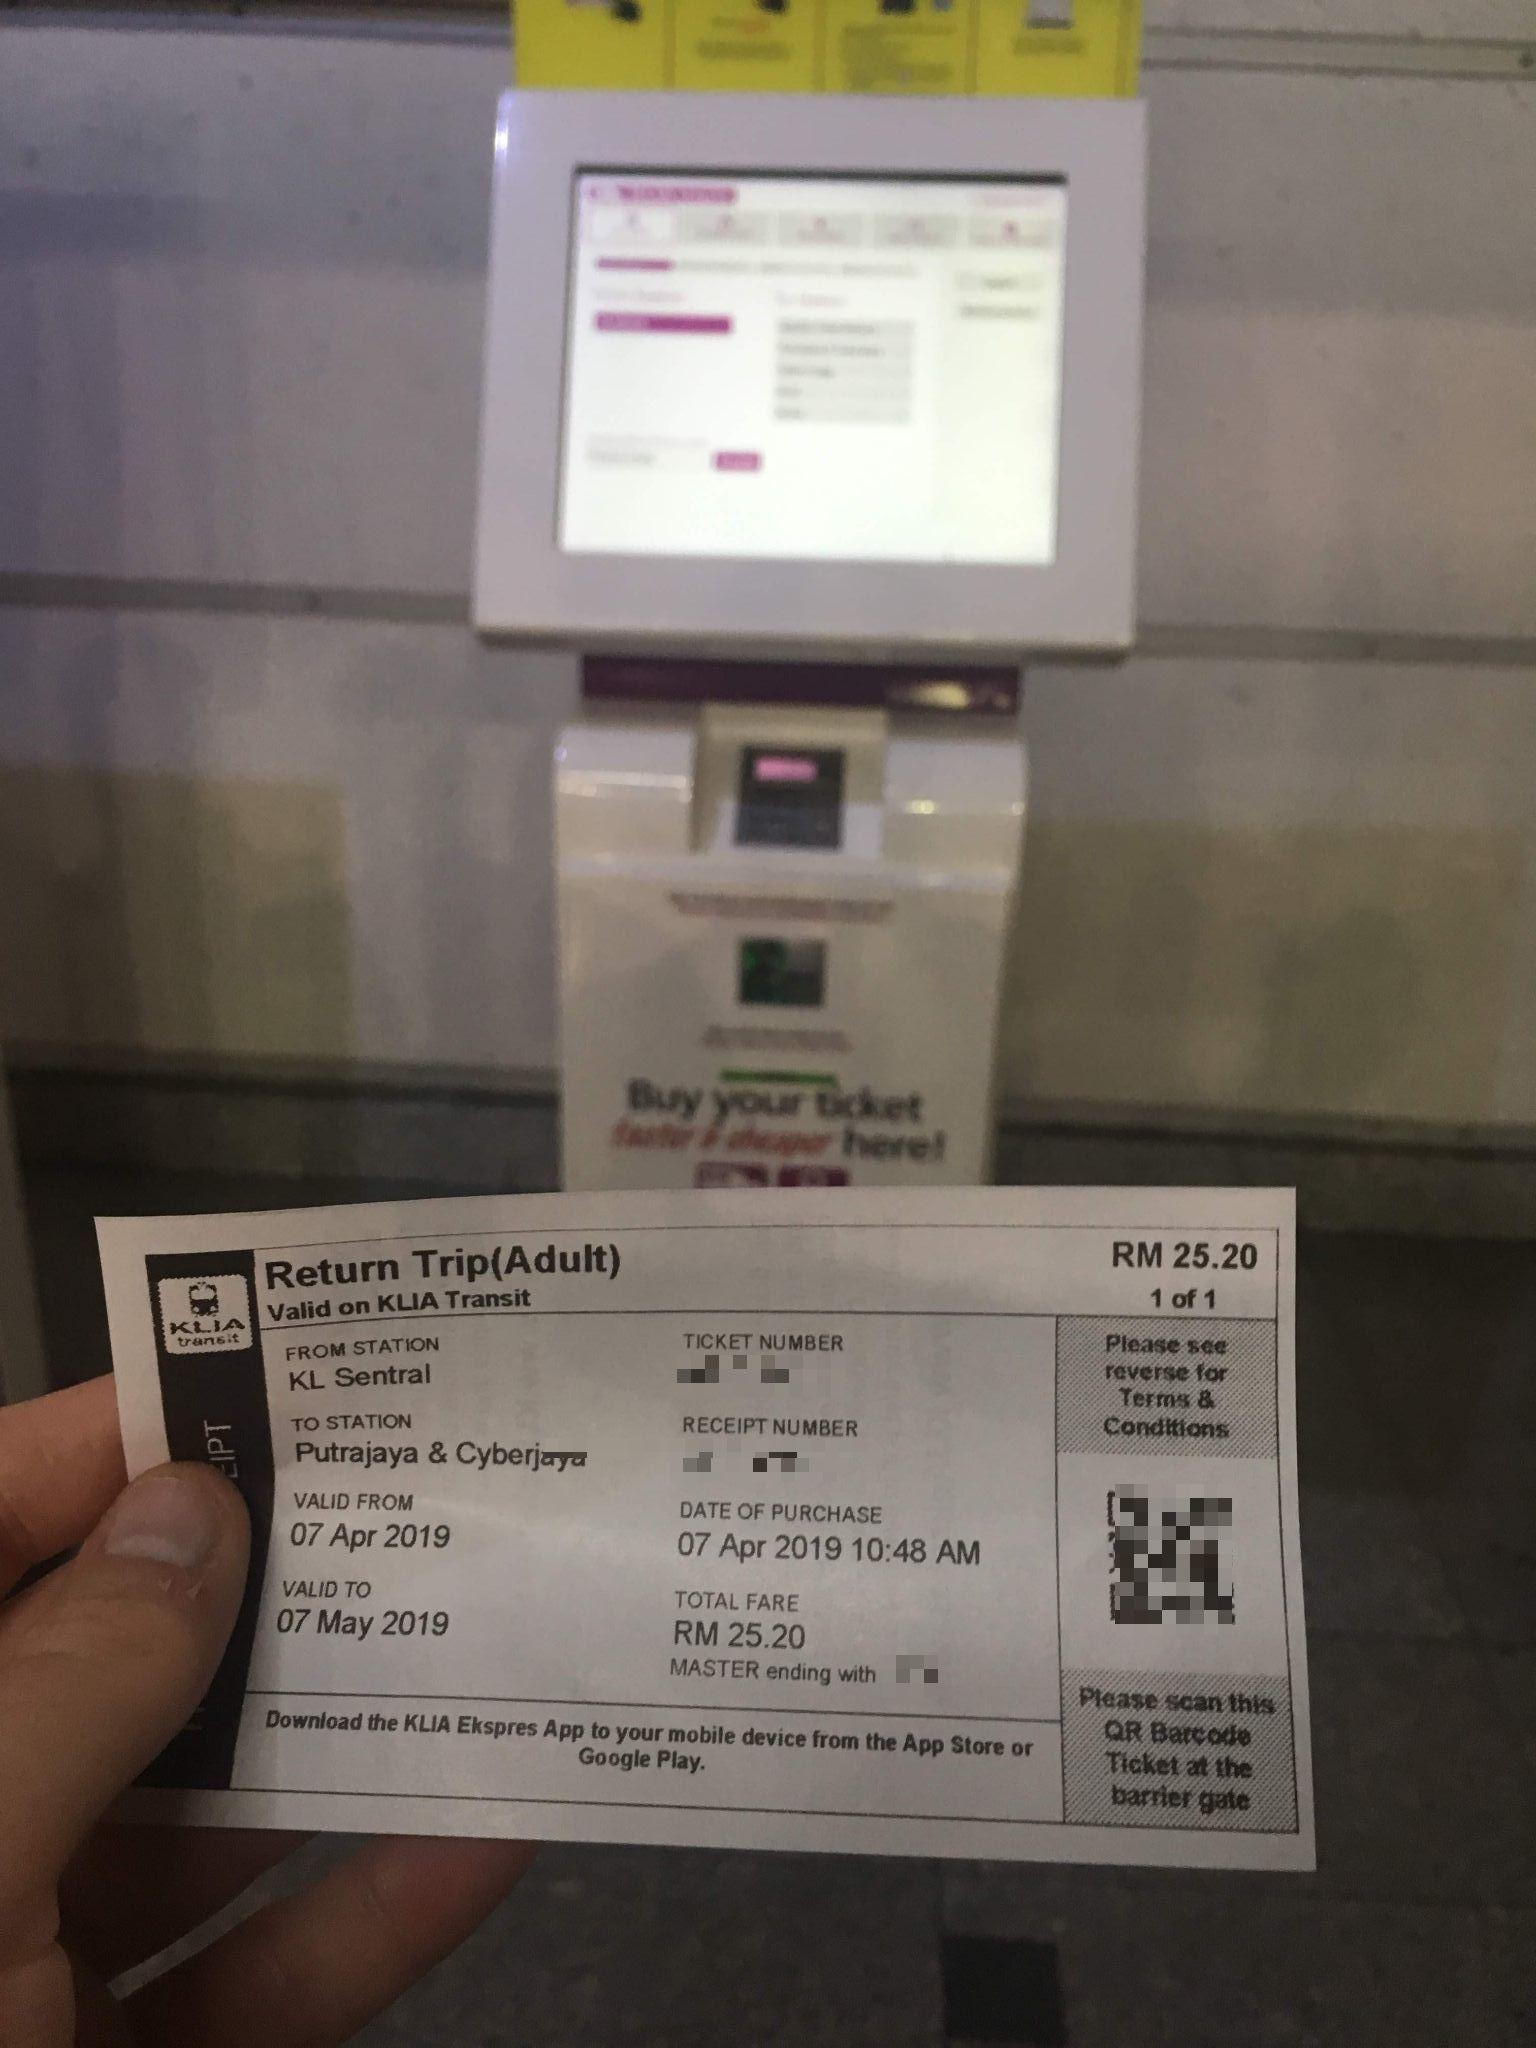 purchasing a ticket from Kuala Lumpur to Putrajaya